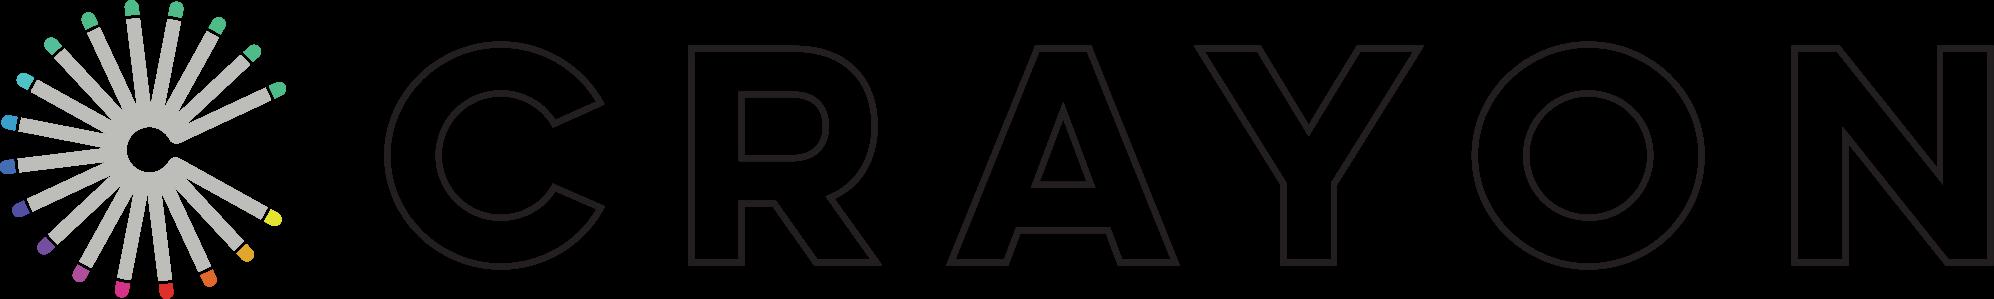 logo-crayon.png